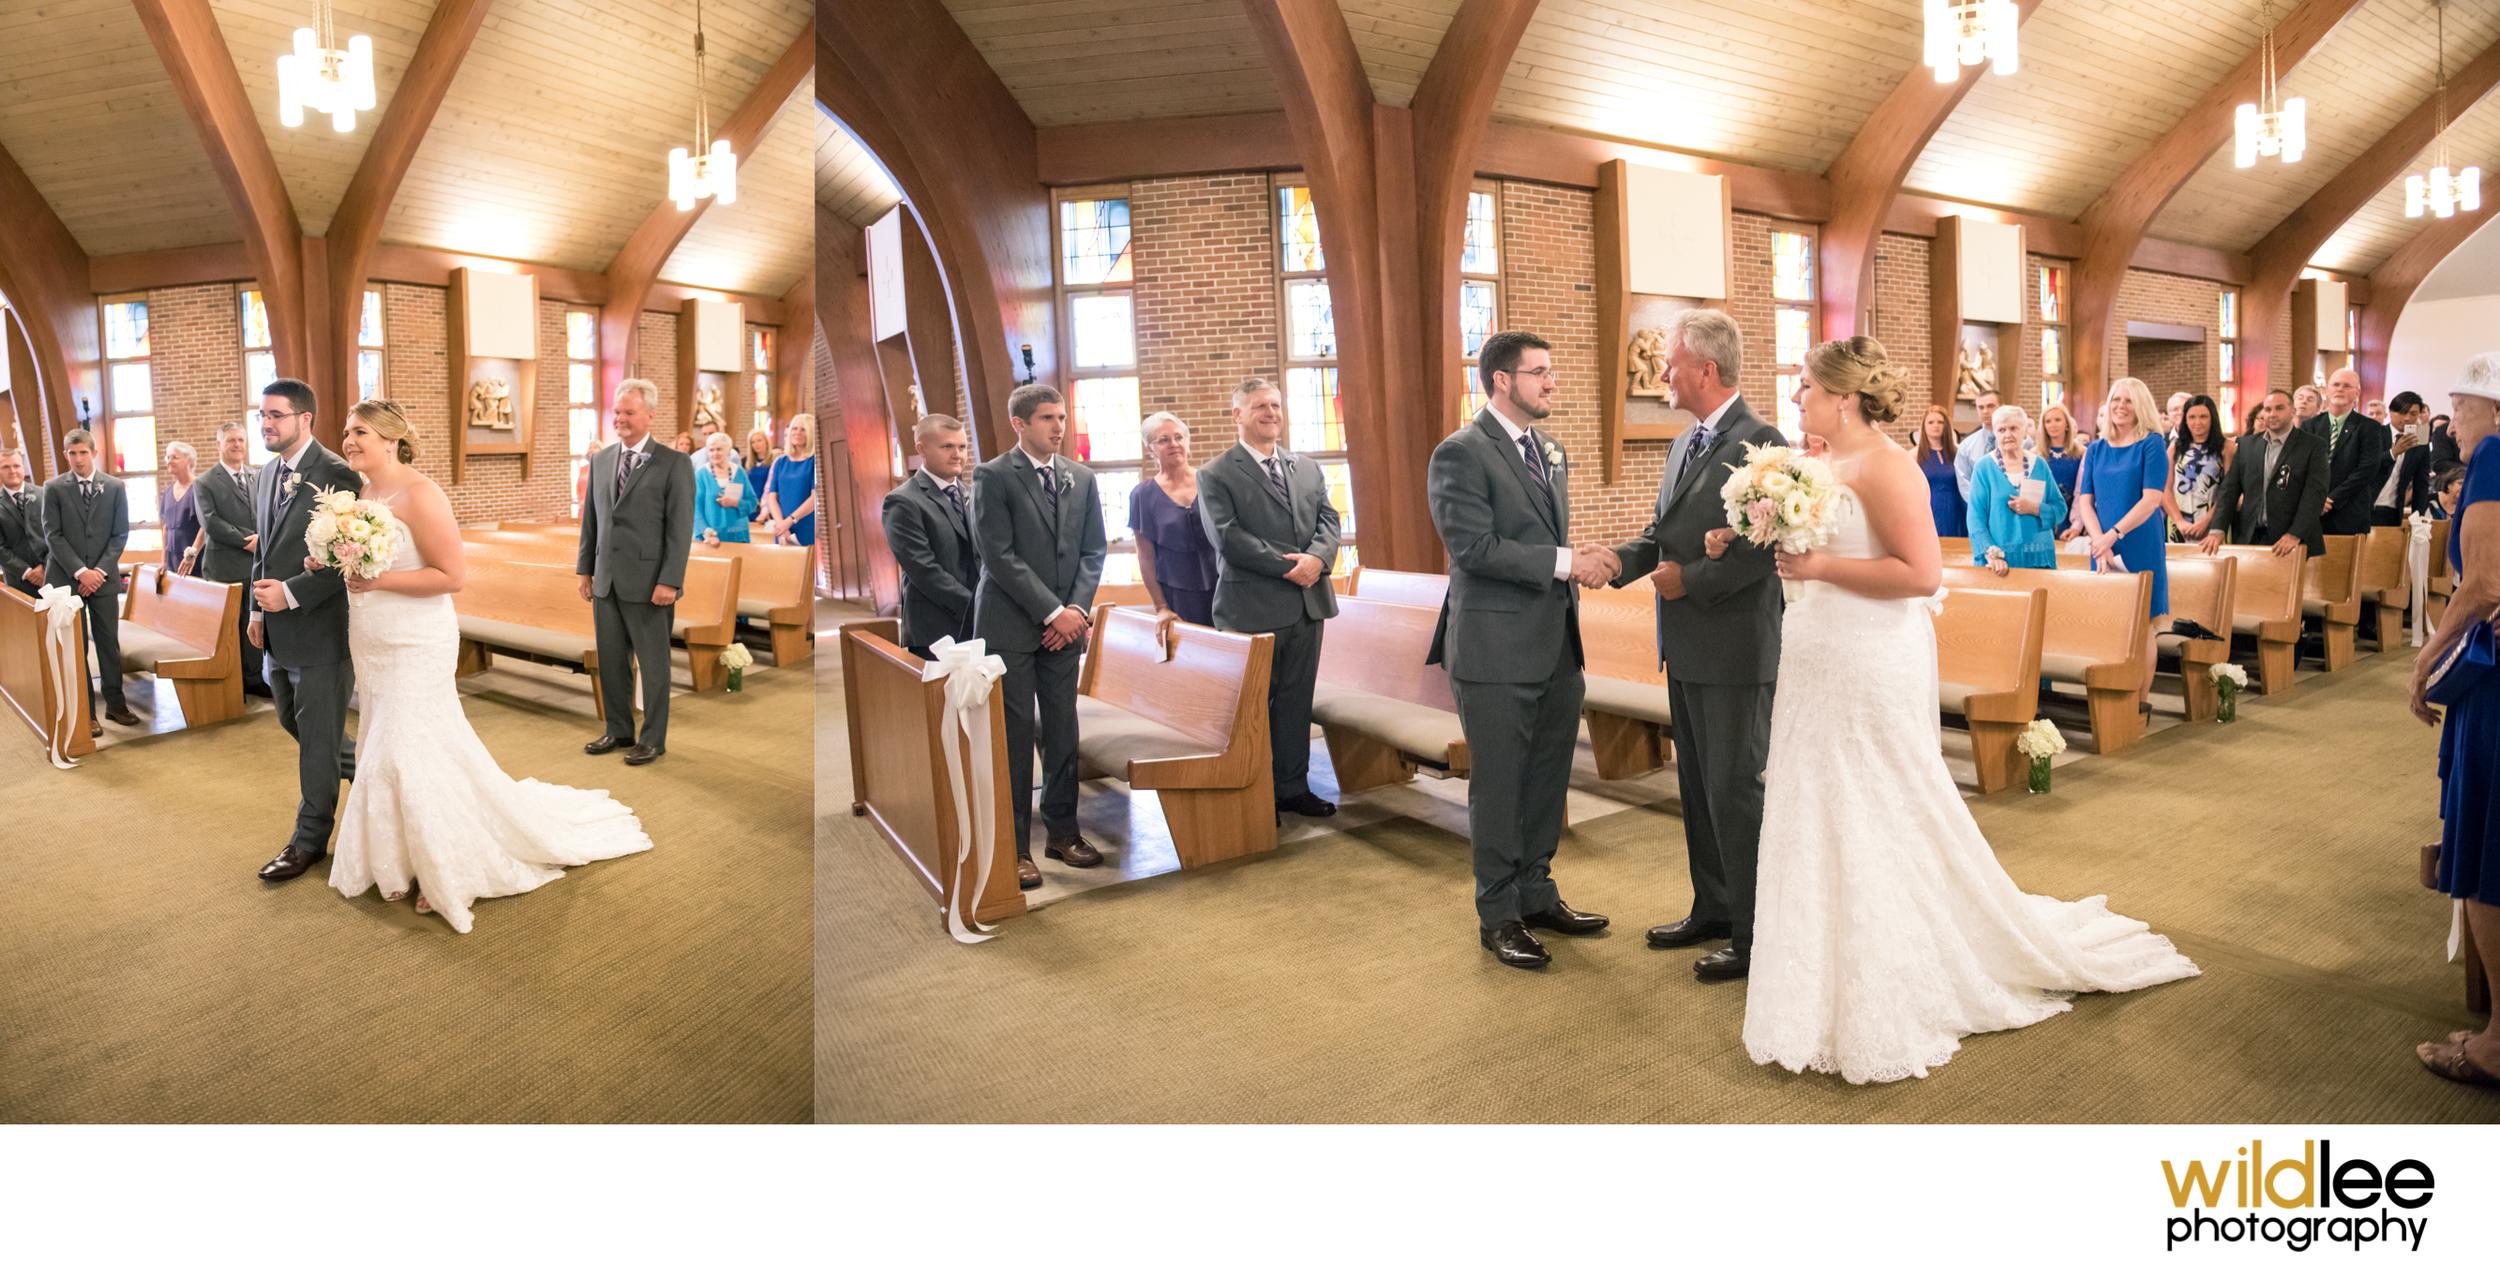 Ceremony6.jpg